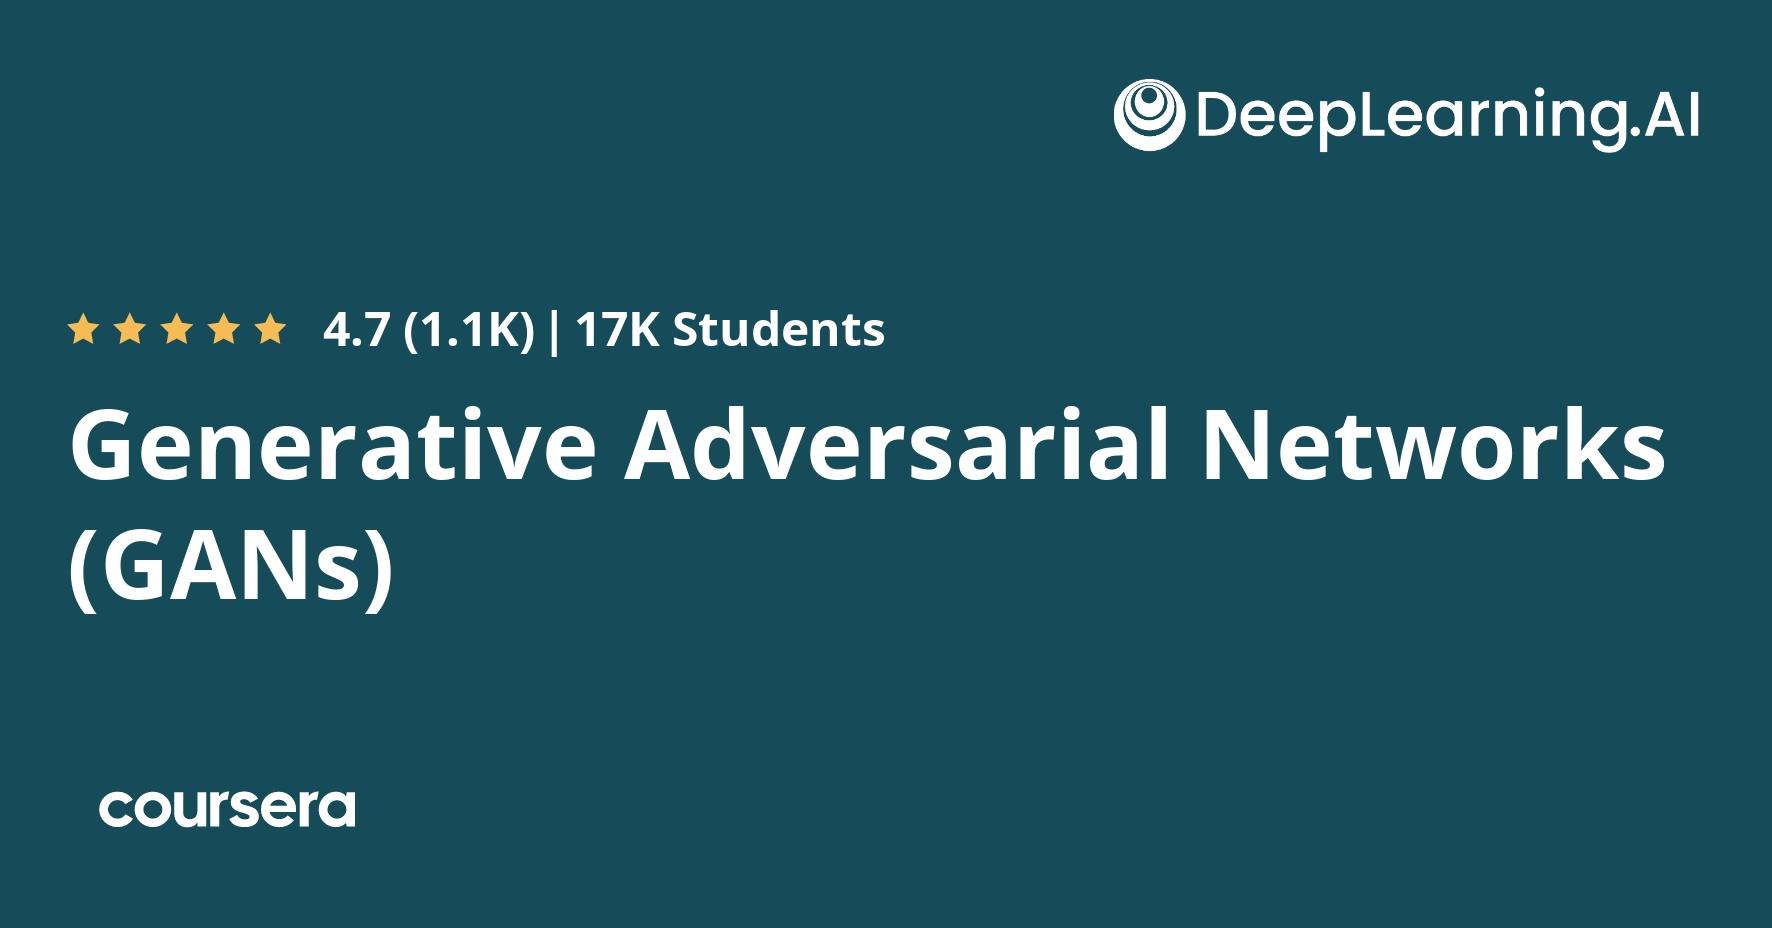 Generative Adversarial Networks (GANs) Specialization